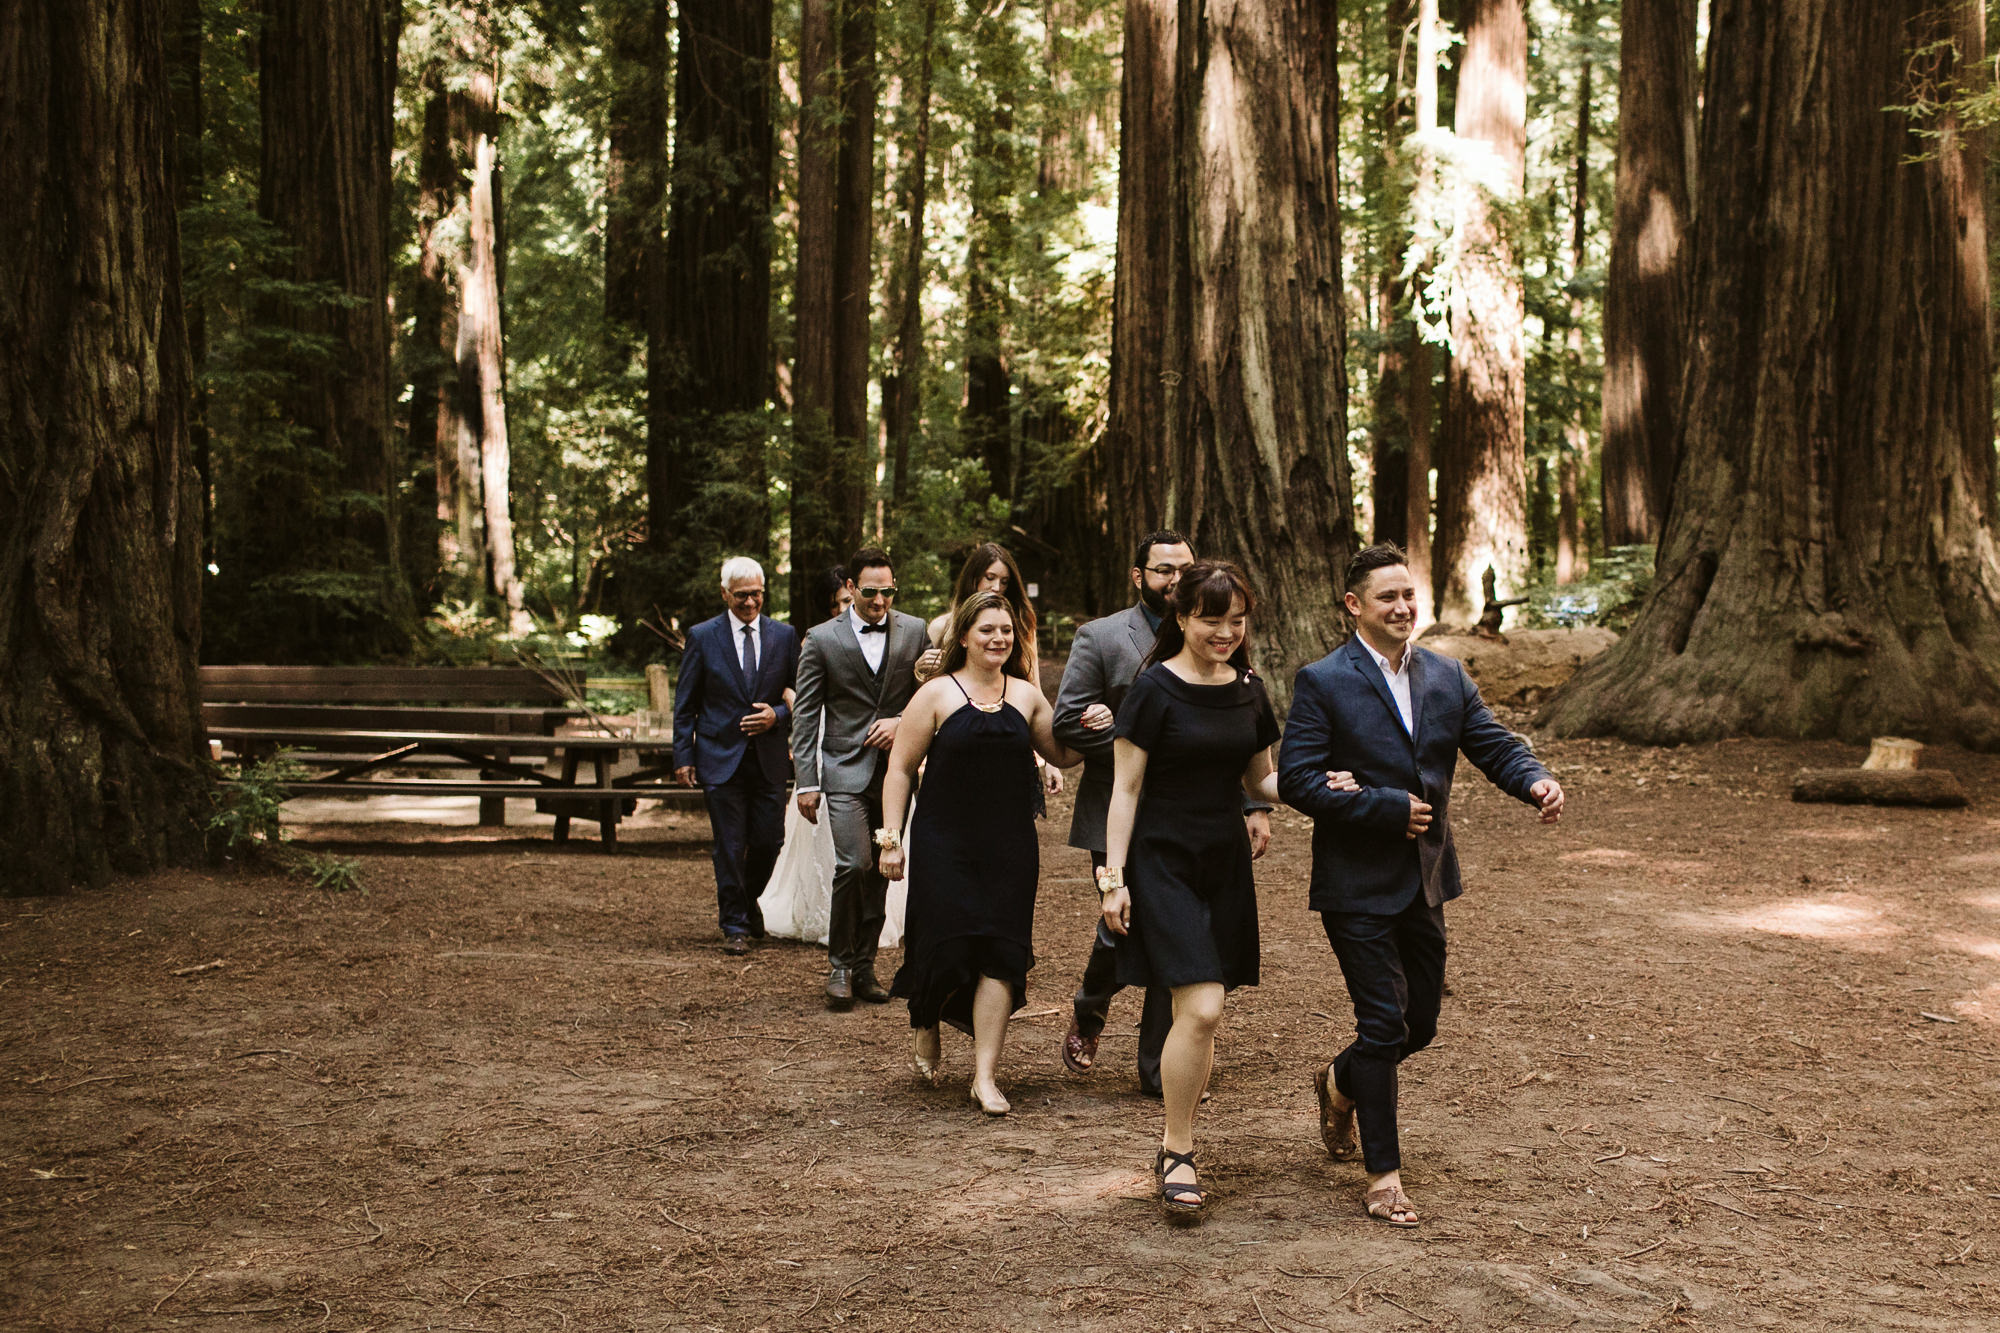 California-wedding-photographer-alfonso-flores-pamplin-groove-168.jpg